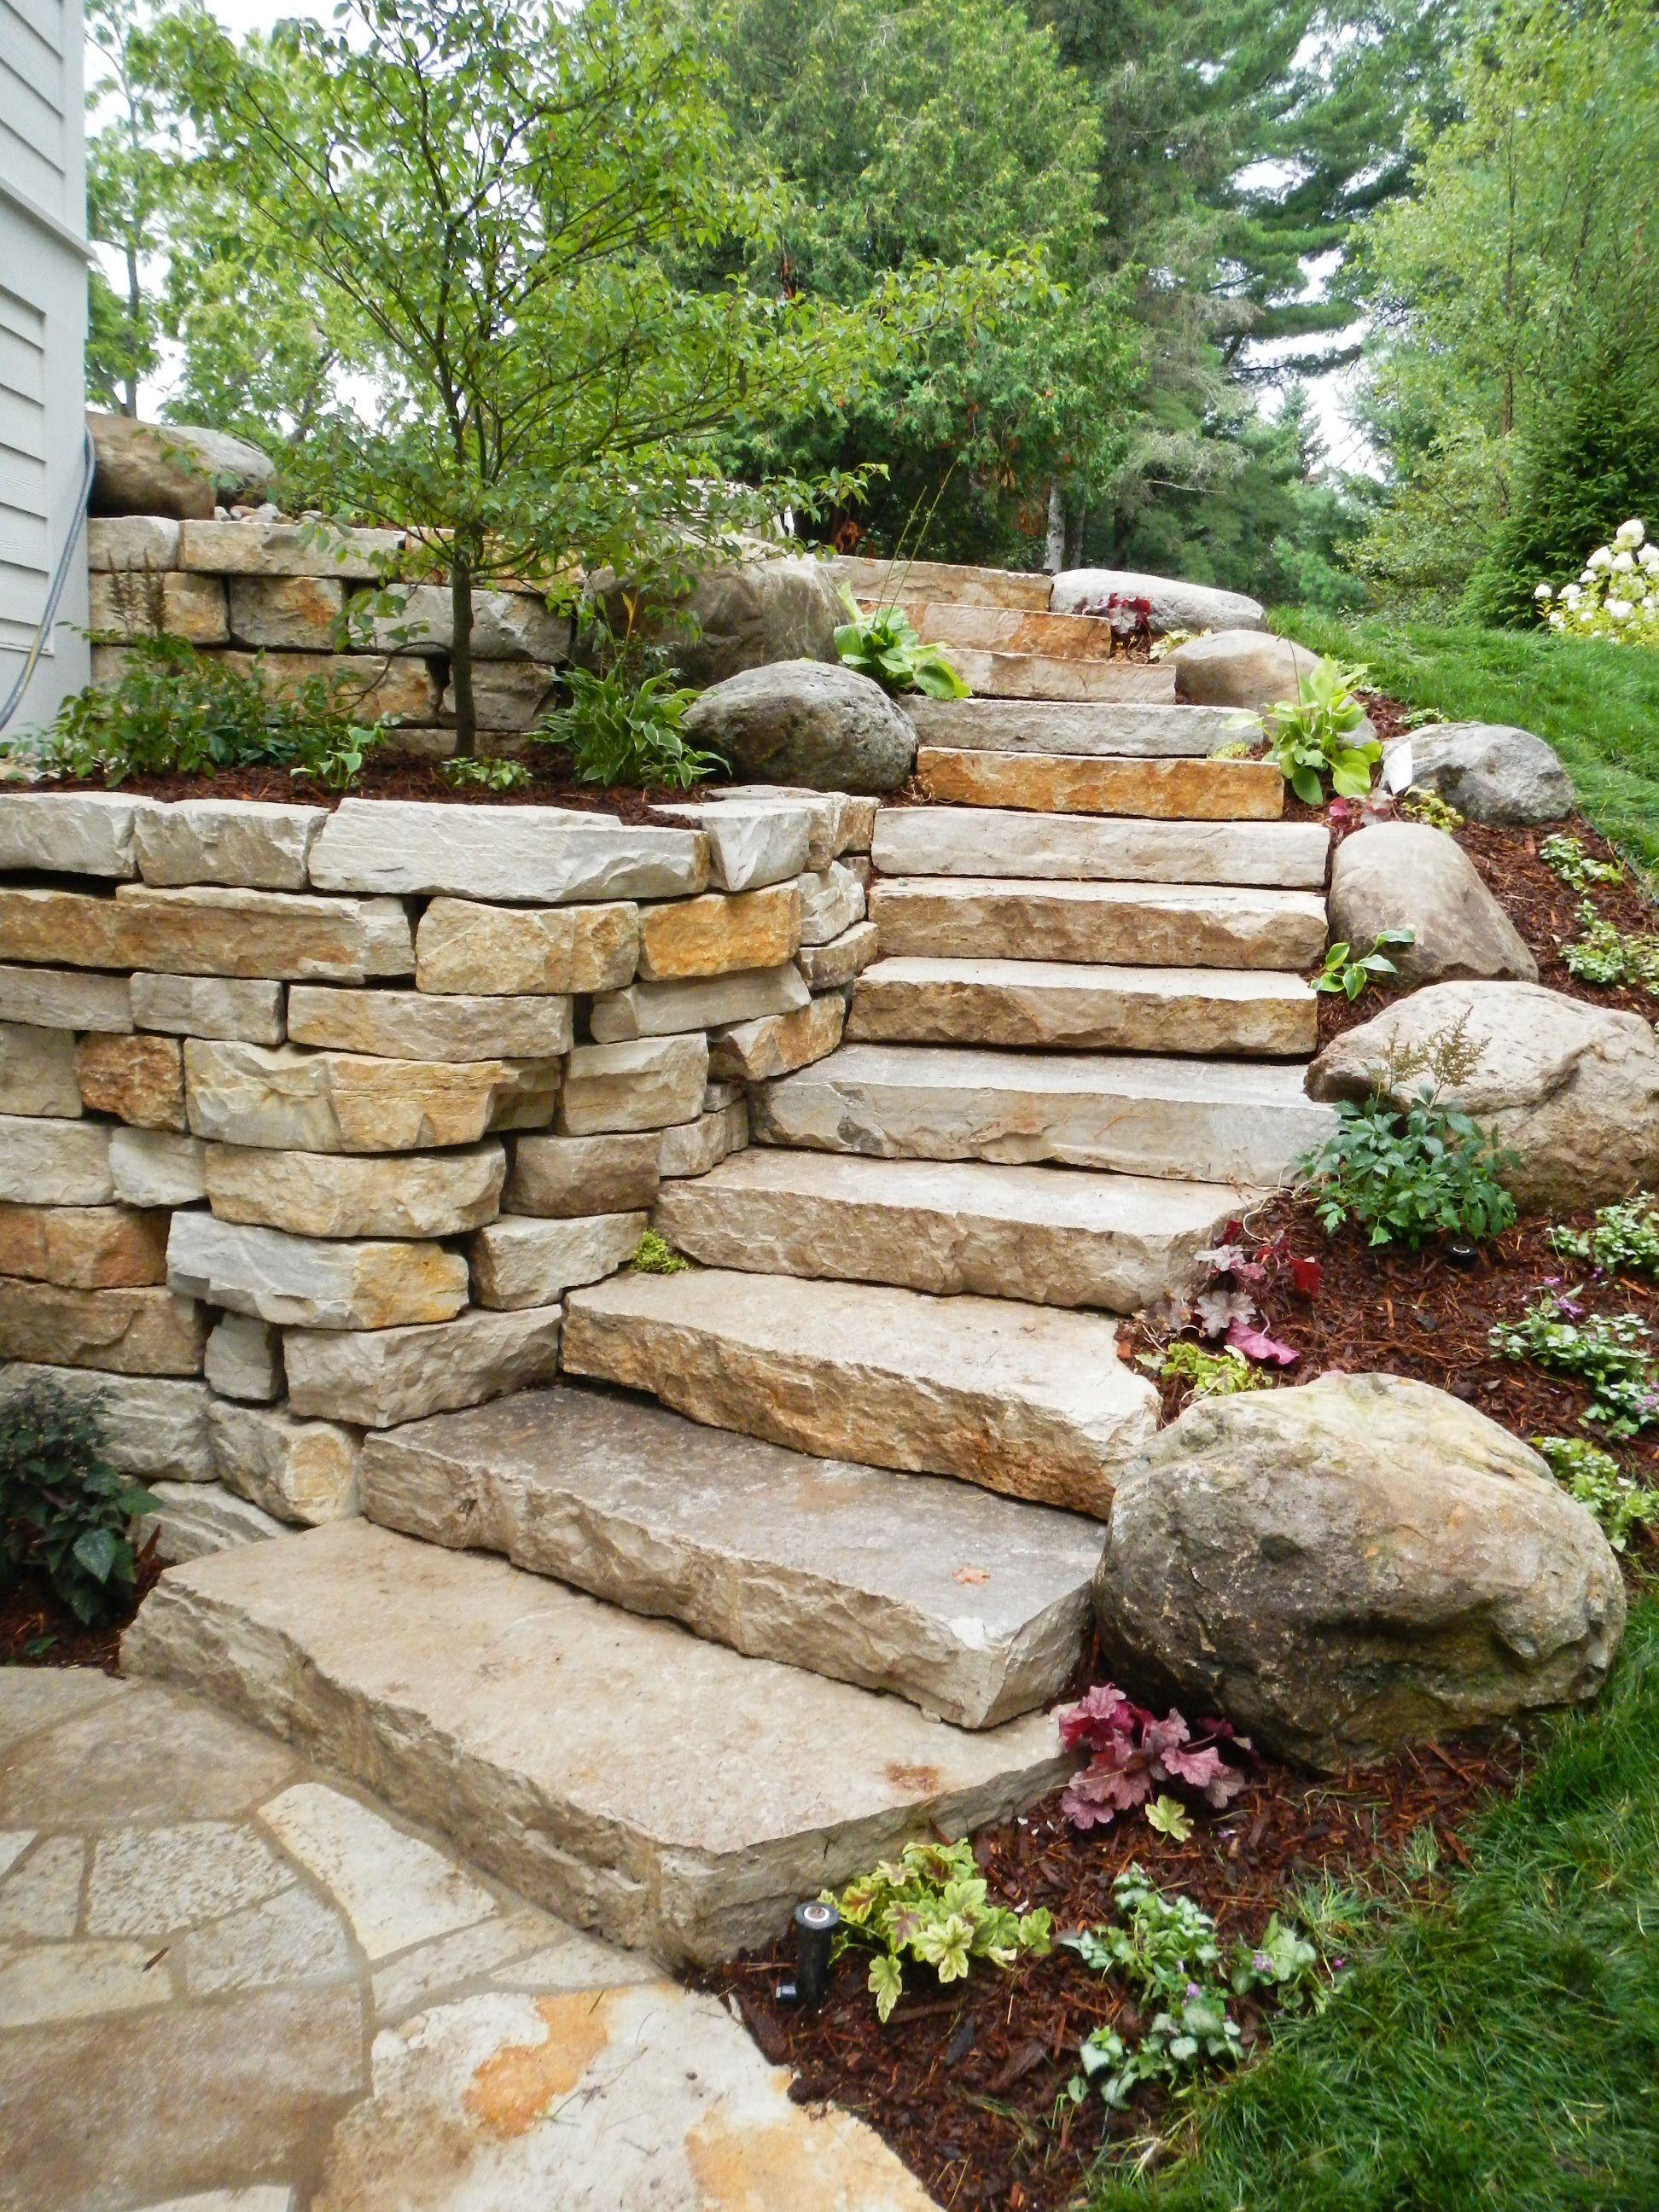 Best Fondulac Slabstone Backyard Landscaping Backyard Garden 400 x 300